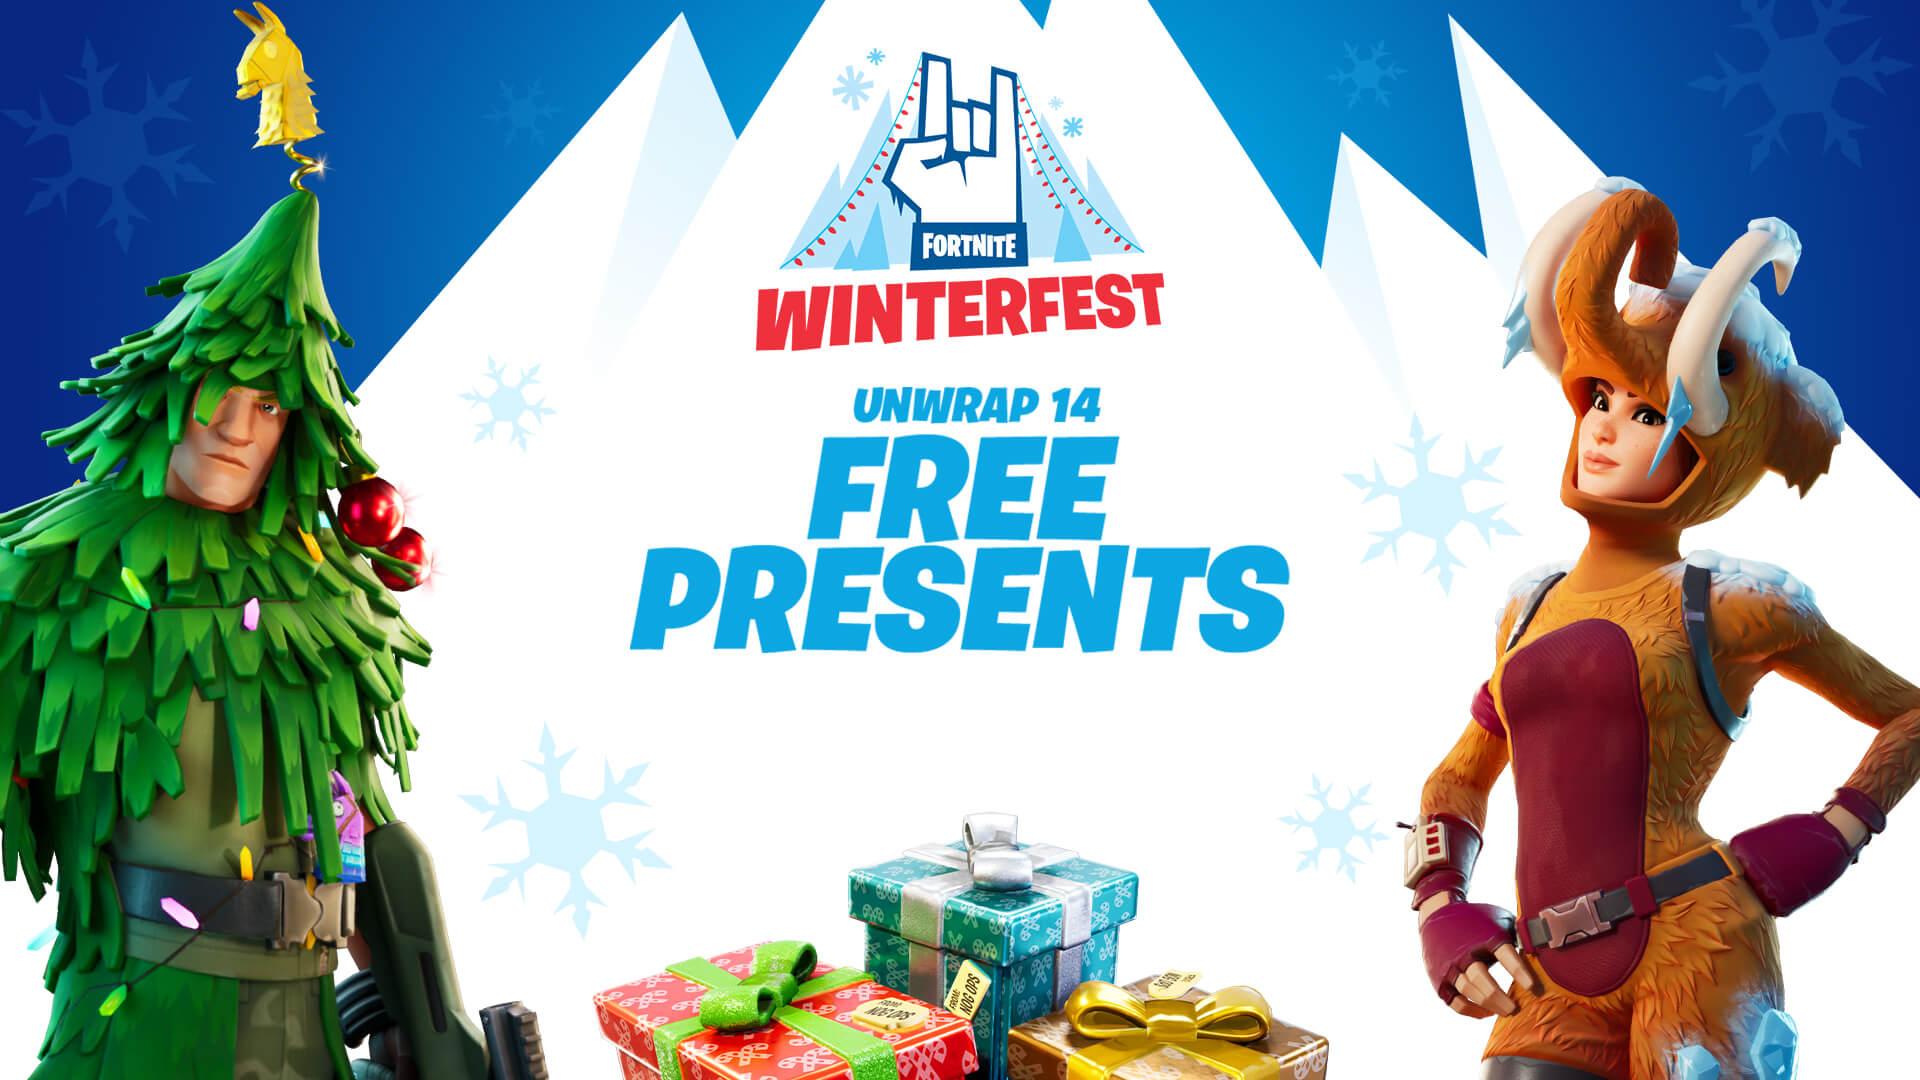 Fortnite Winterfest Presents